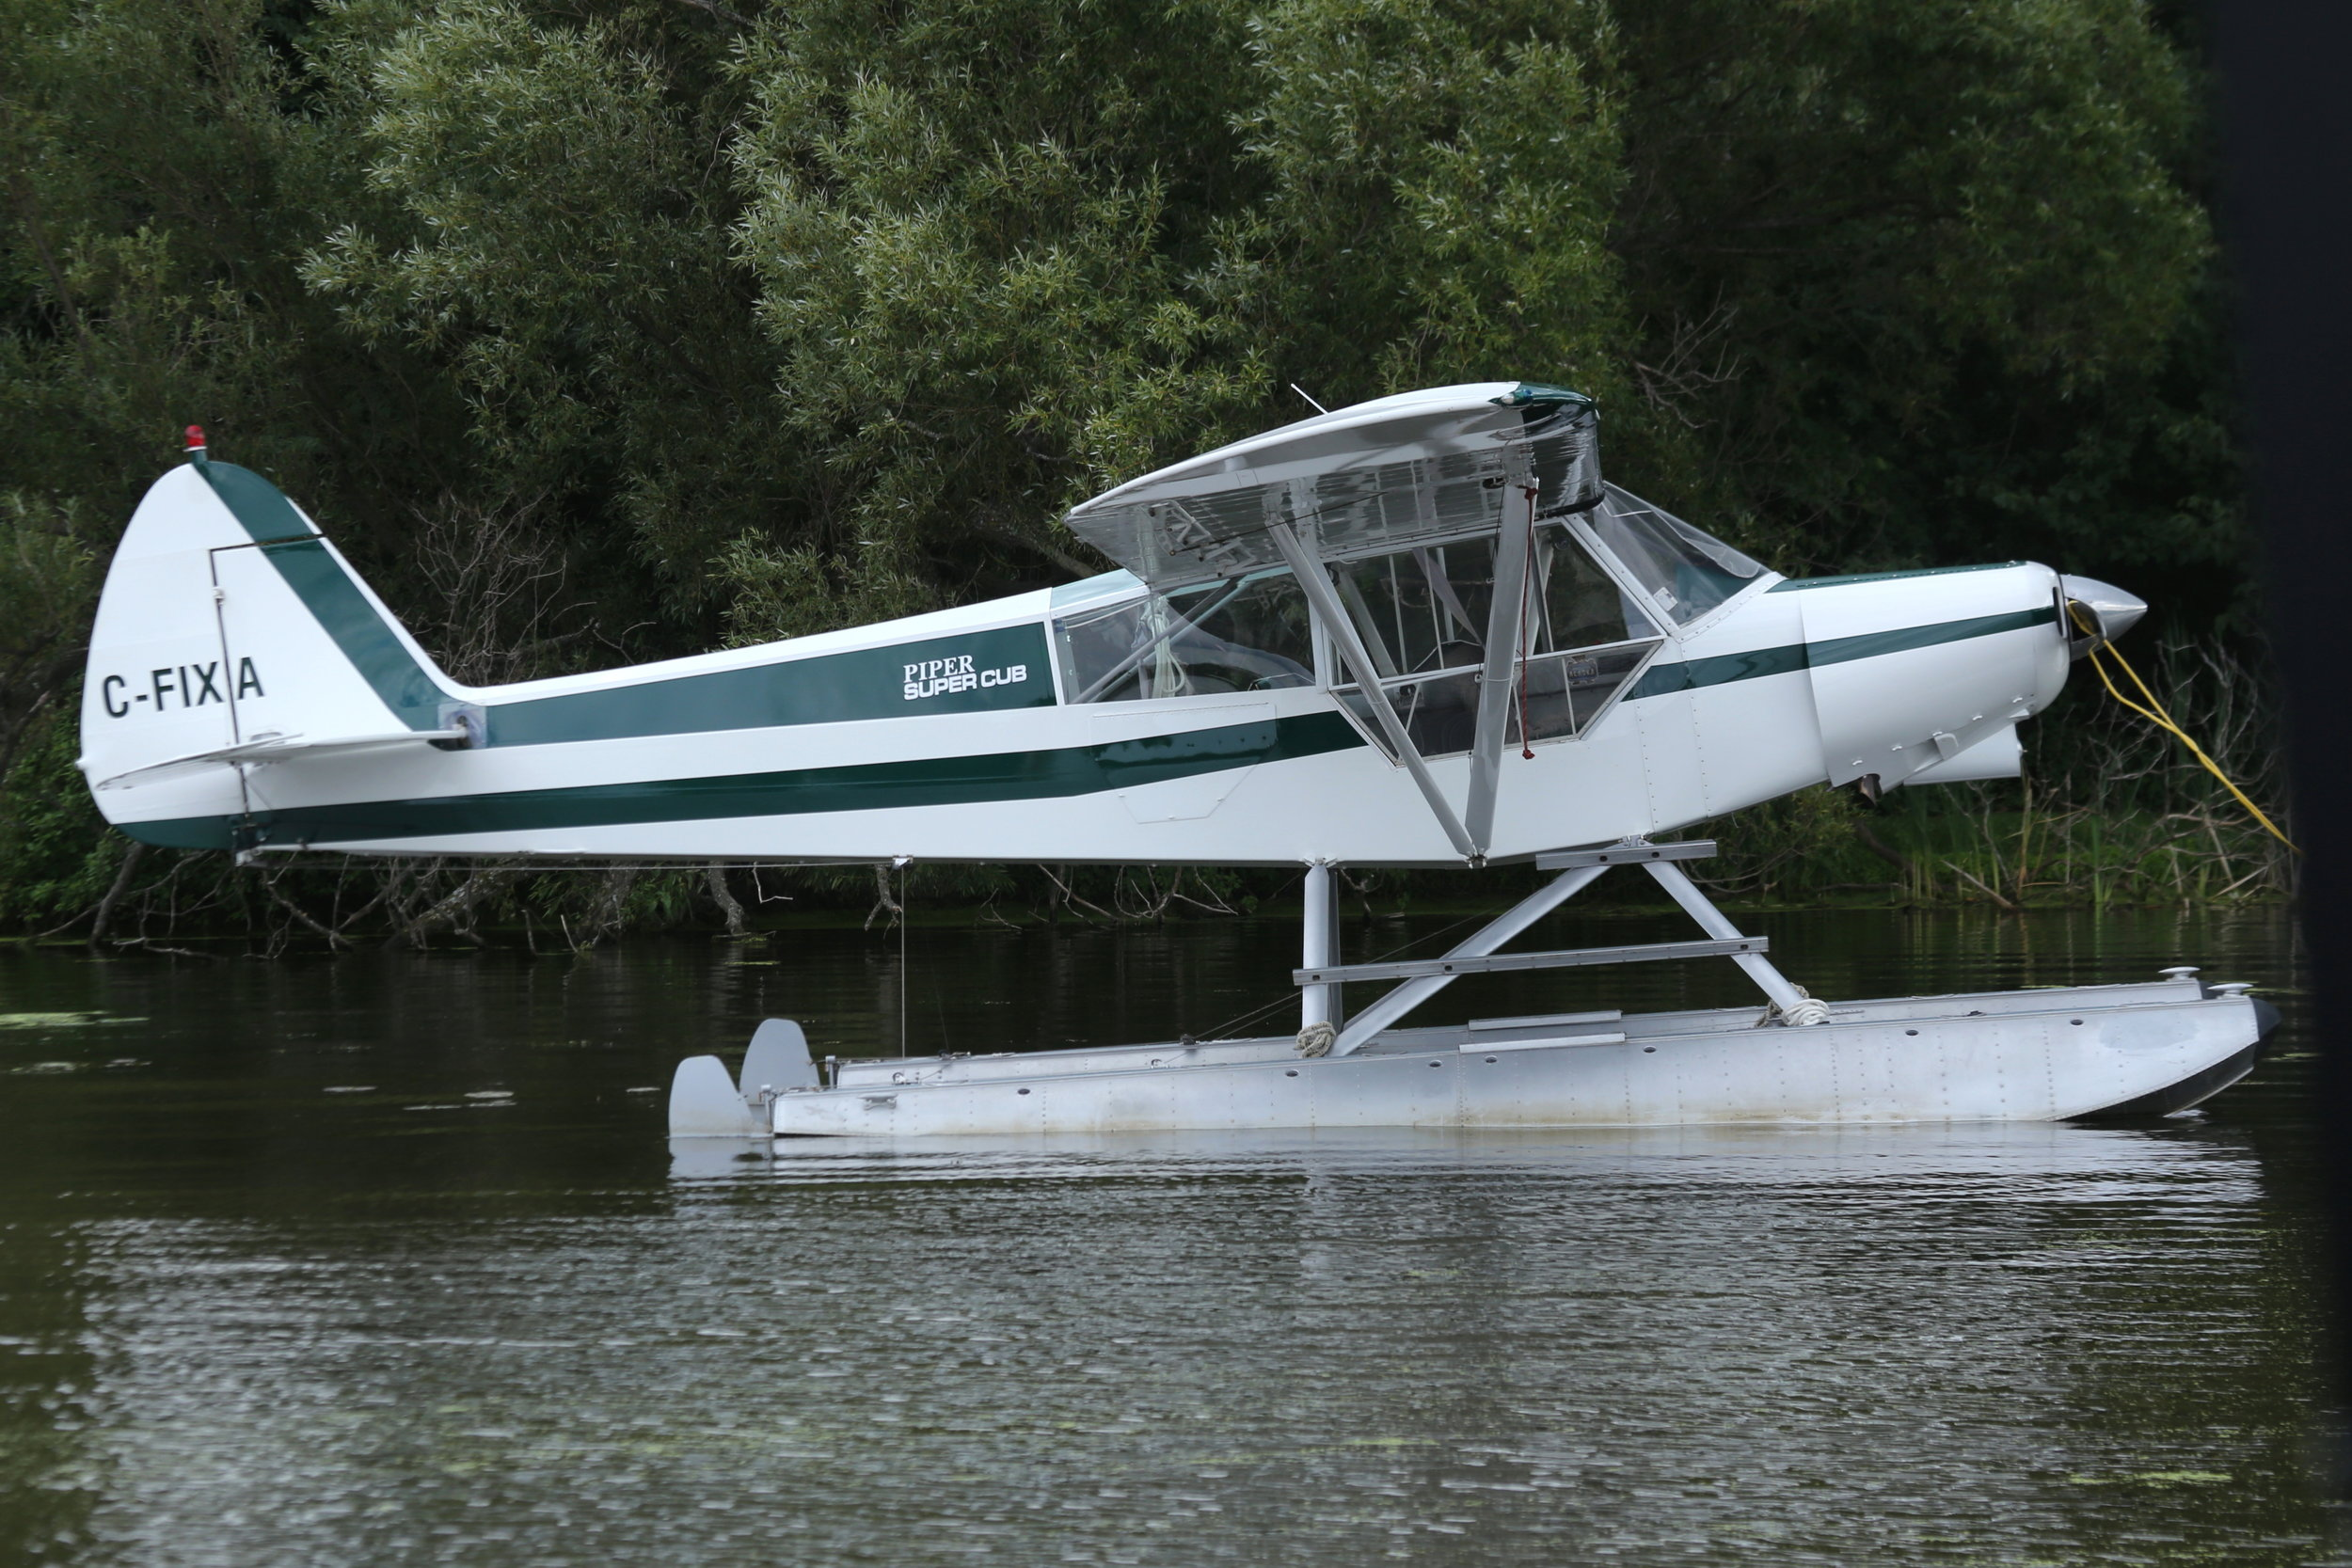 C-FIXA PA18F Super Cub taken at Lake Winnibago 26th July 2018 by John Wood